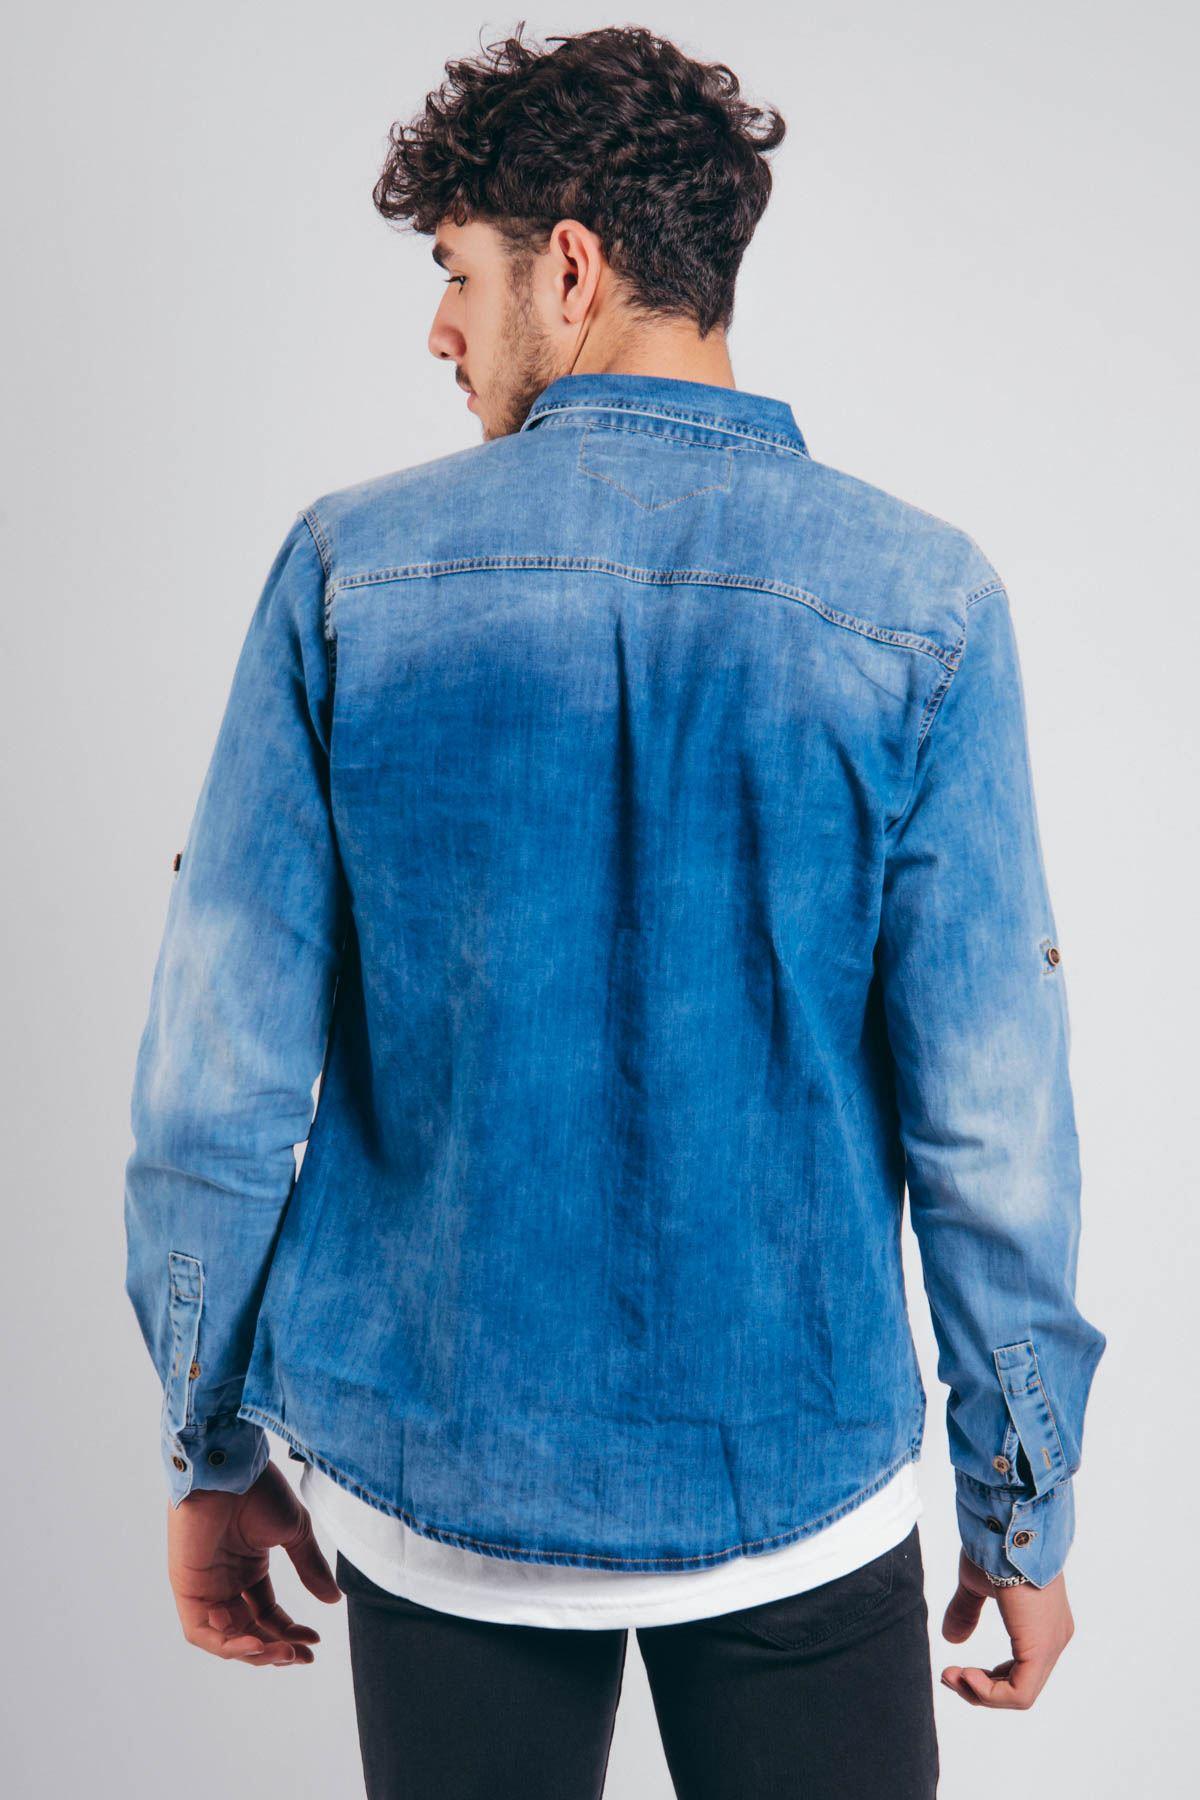 Mavi Randım Yıkama Erkek Kot Gömlek